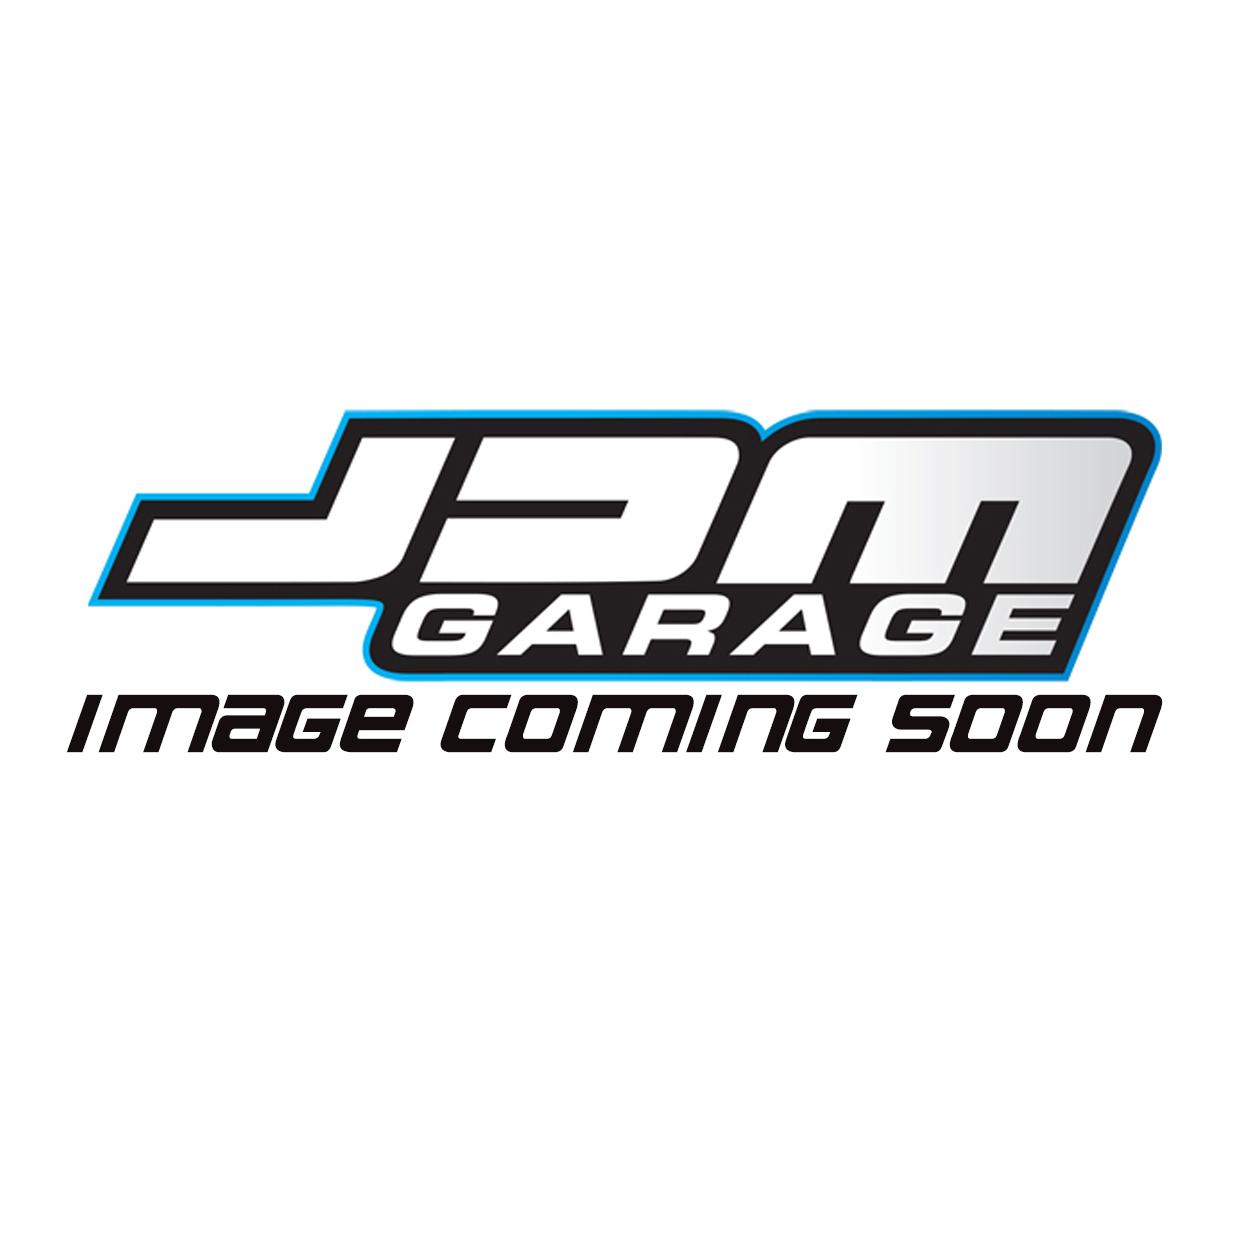 Haltech Elite 1000+ ECU Subaru WRX MY93-96 With Plug 'n' Play Adaptor Harness Kit